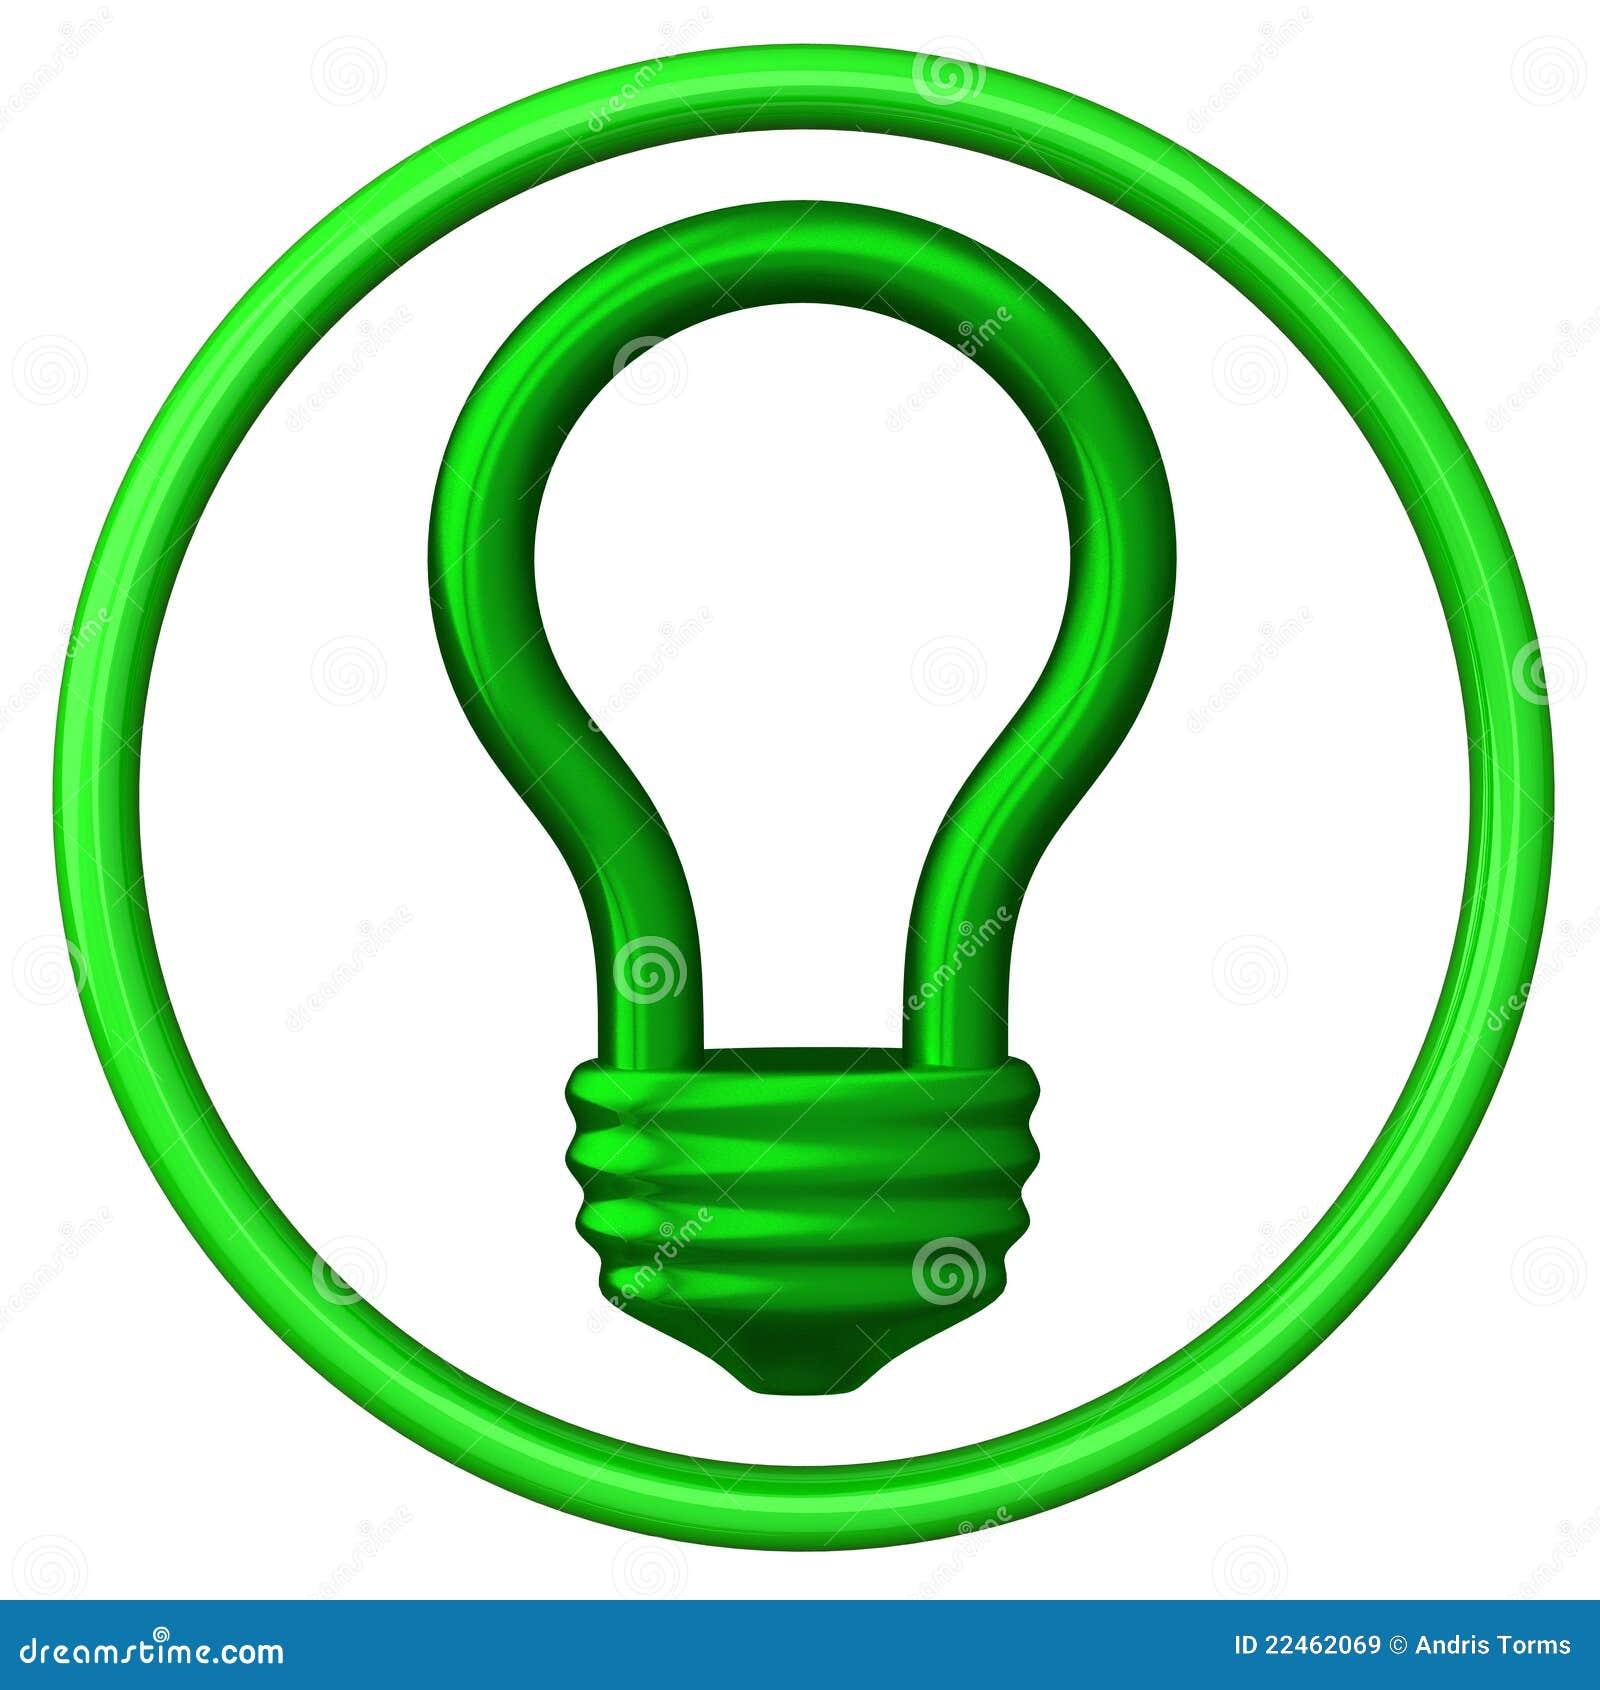 Green Light Bulb Icon 3d Stock Illustration Illustration Of Electric 22462069